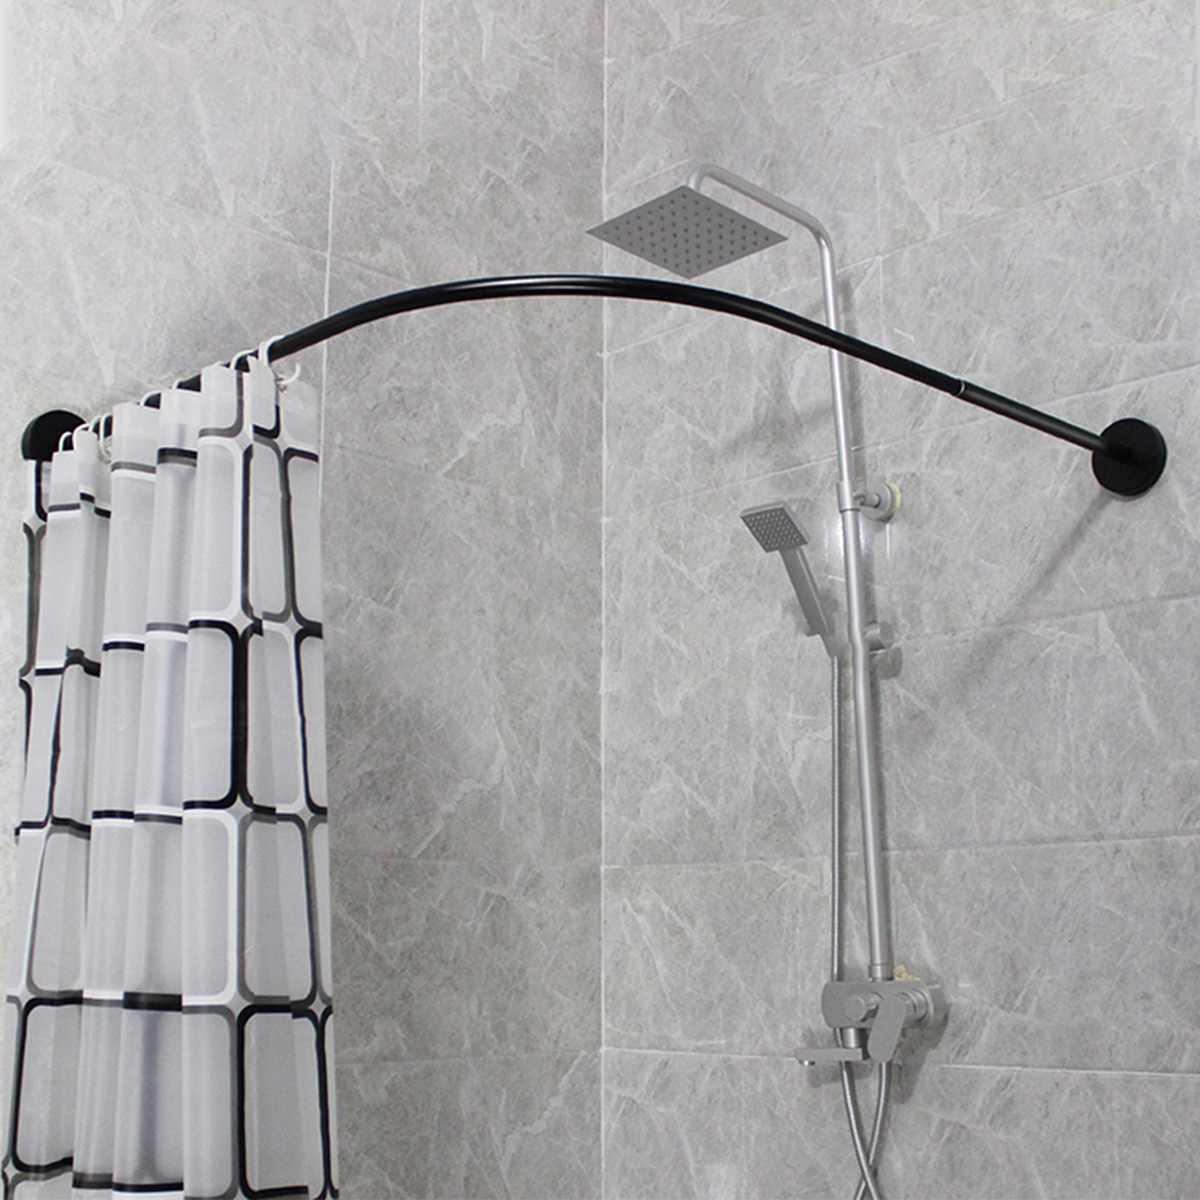 extendable corner shower curtain rod pole 90 130cm stainless steel rail rod bar high quality bath door hardware heavy loaded